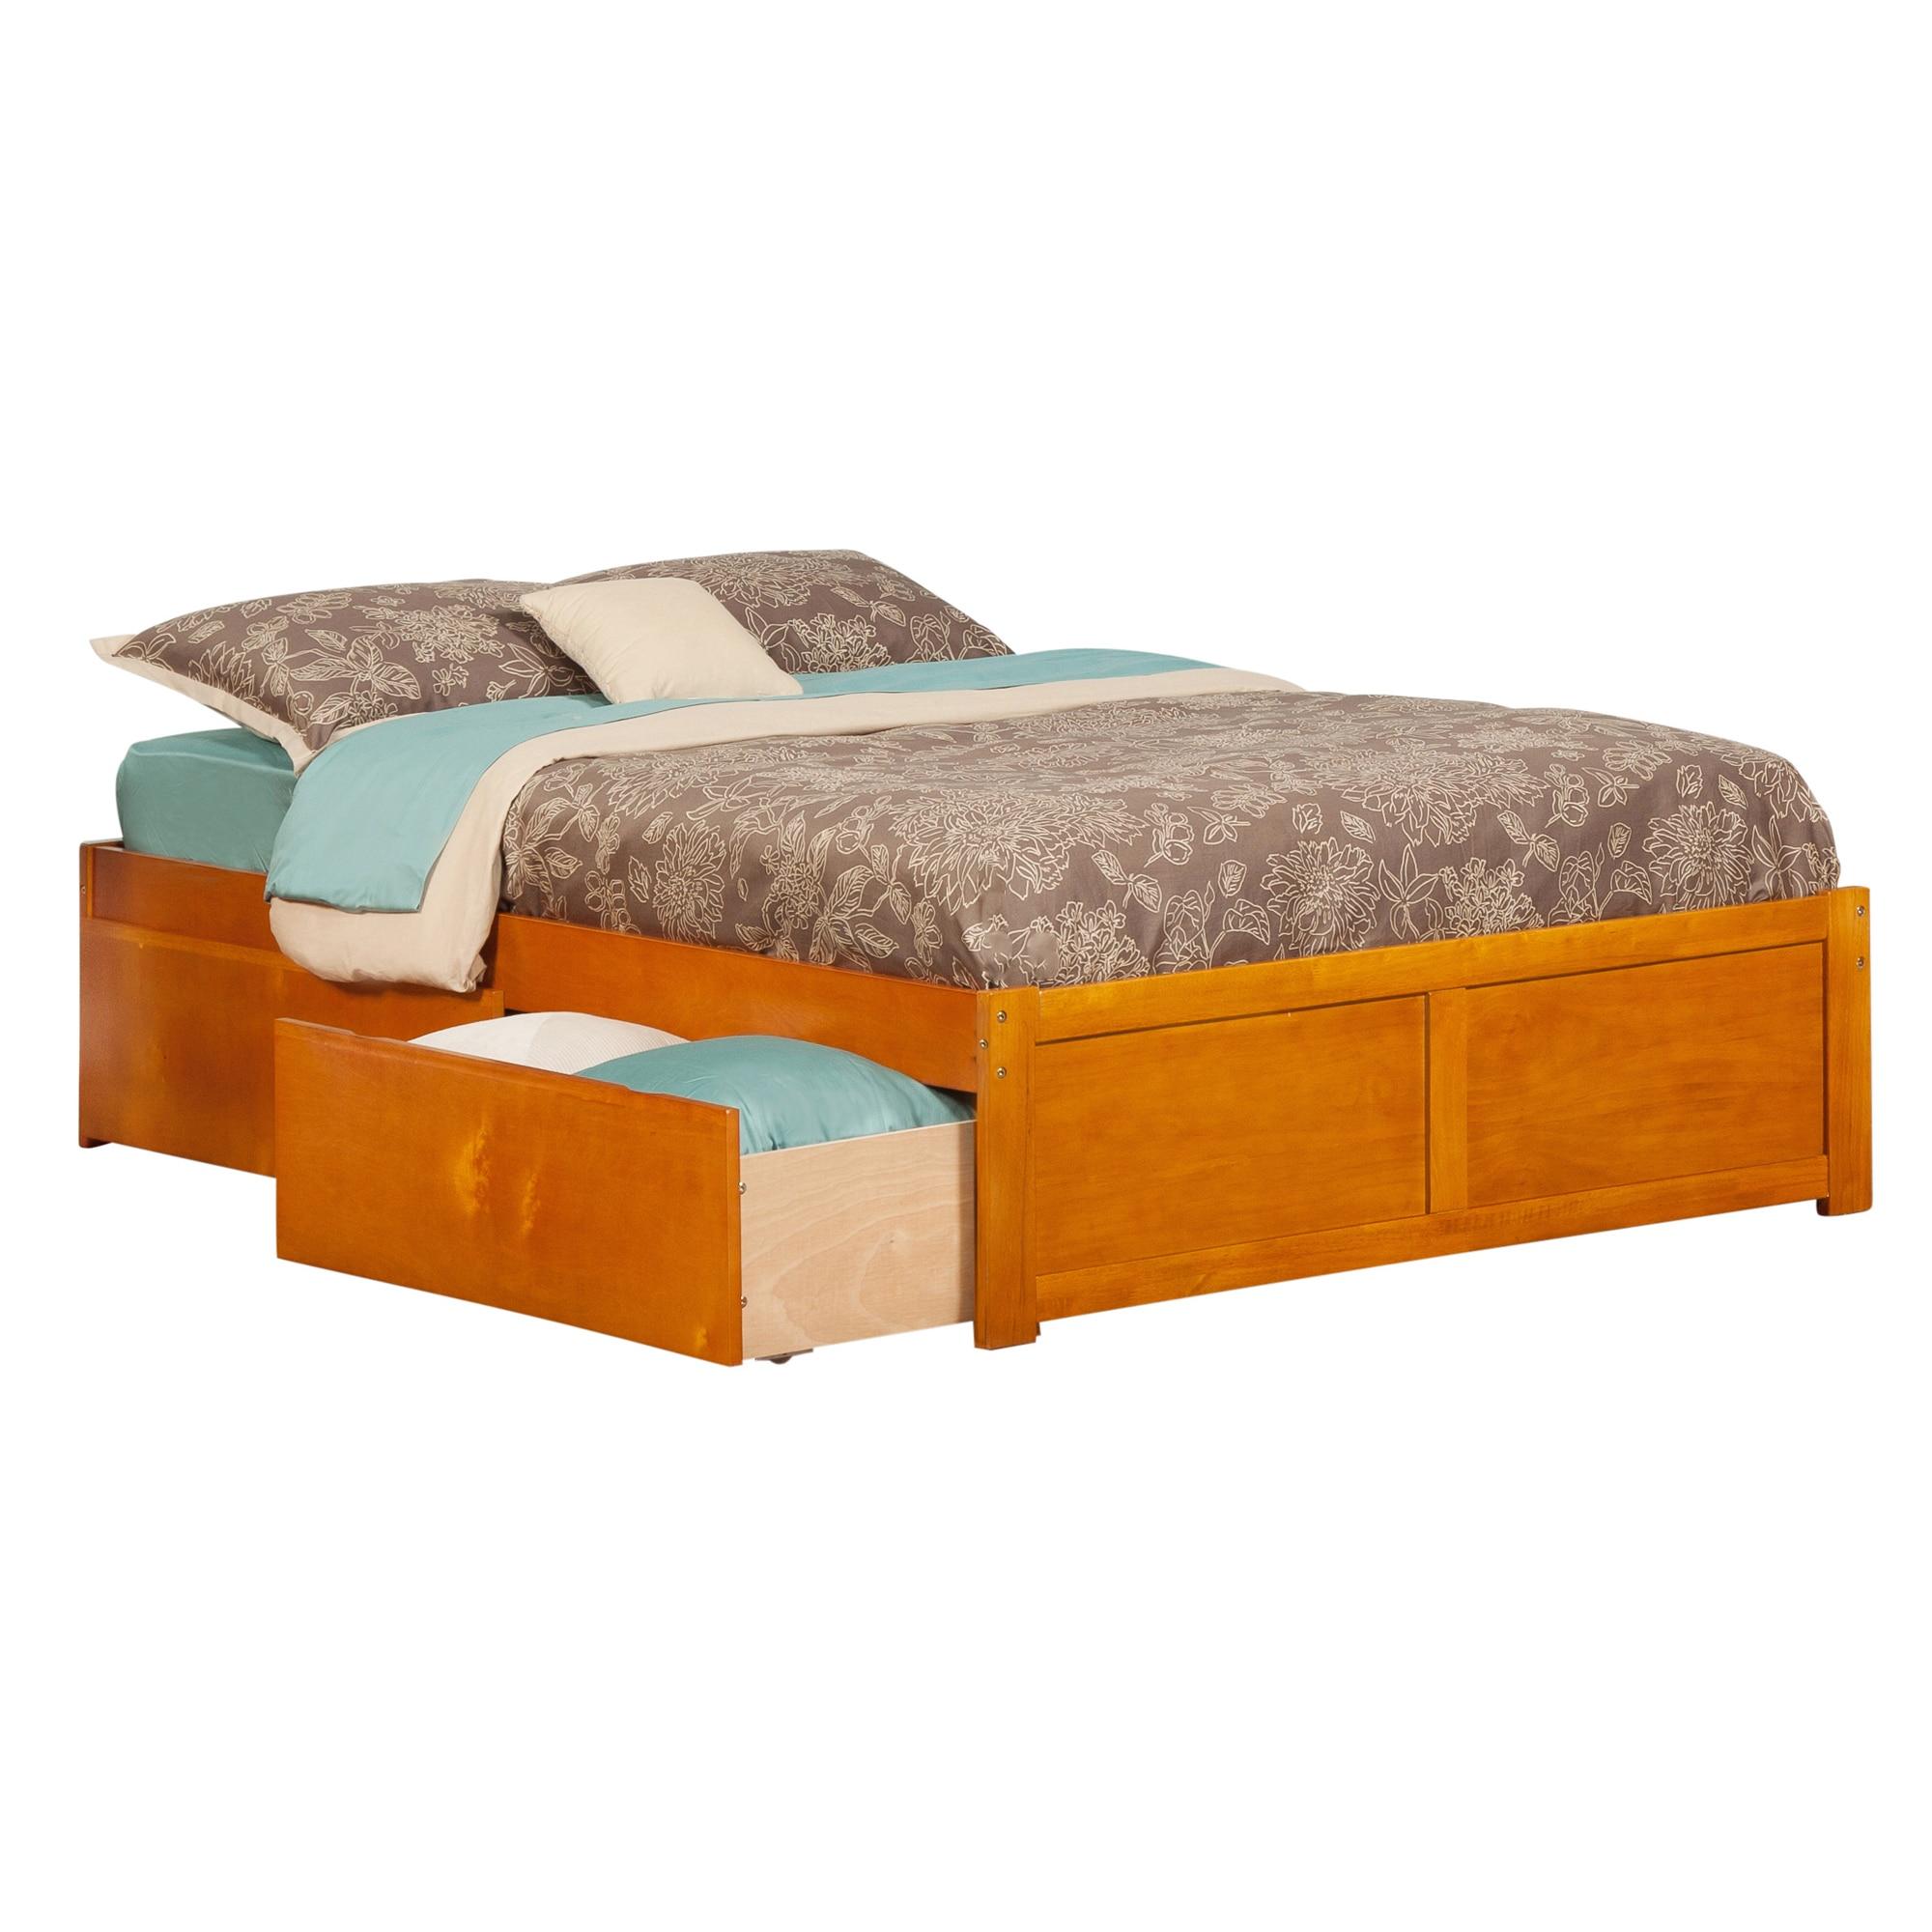 Atlantic Furniture Concord Caramel Latte Full Flat Panel Foot Board With 2 Urban Bed Drawers